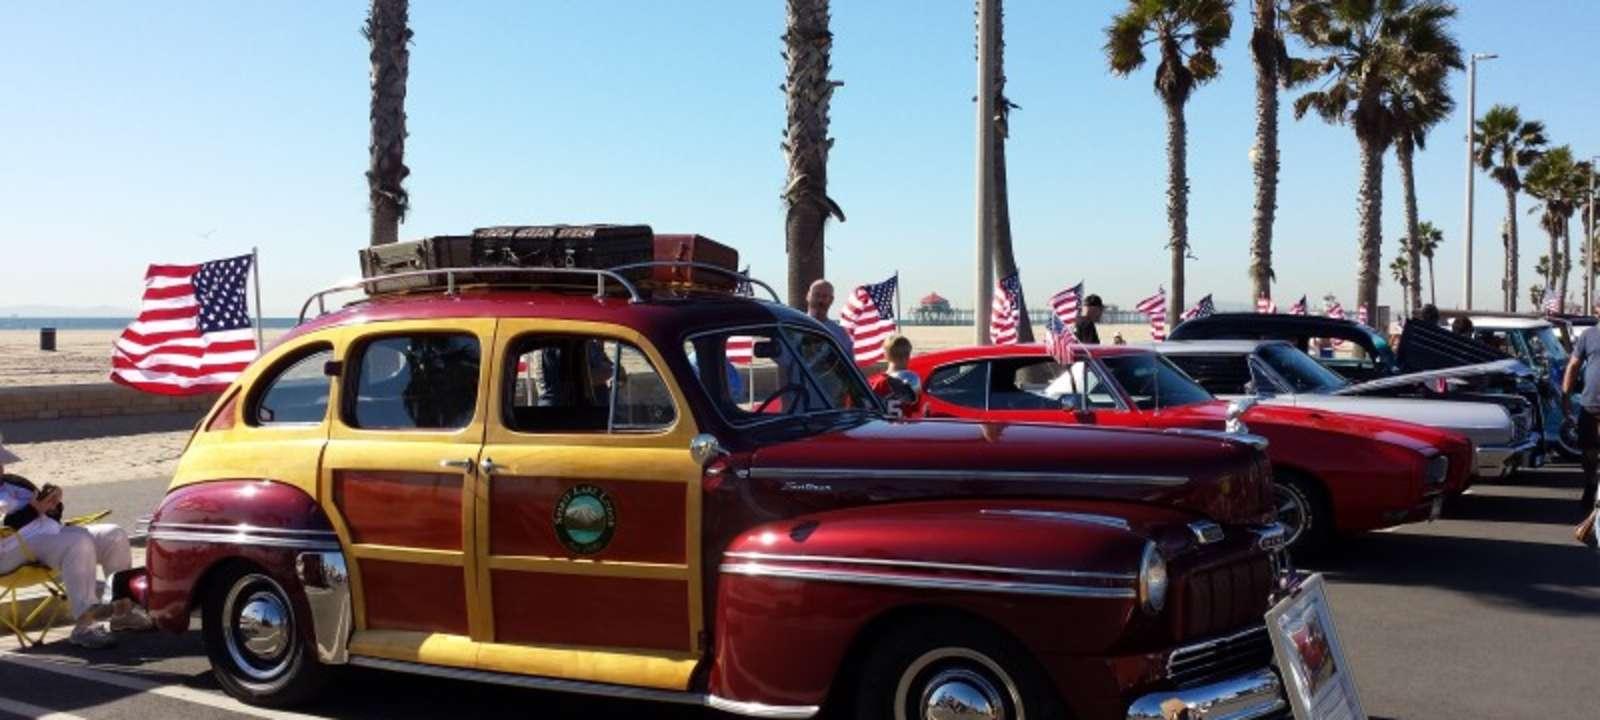 03b7c1404f41 Huntington Beach Car Show on Veterans Day